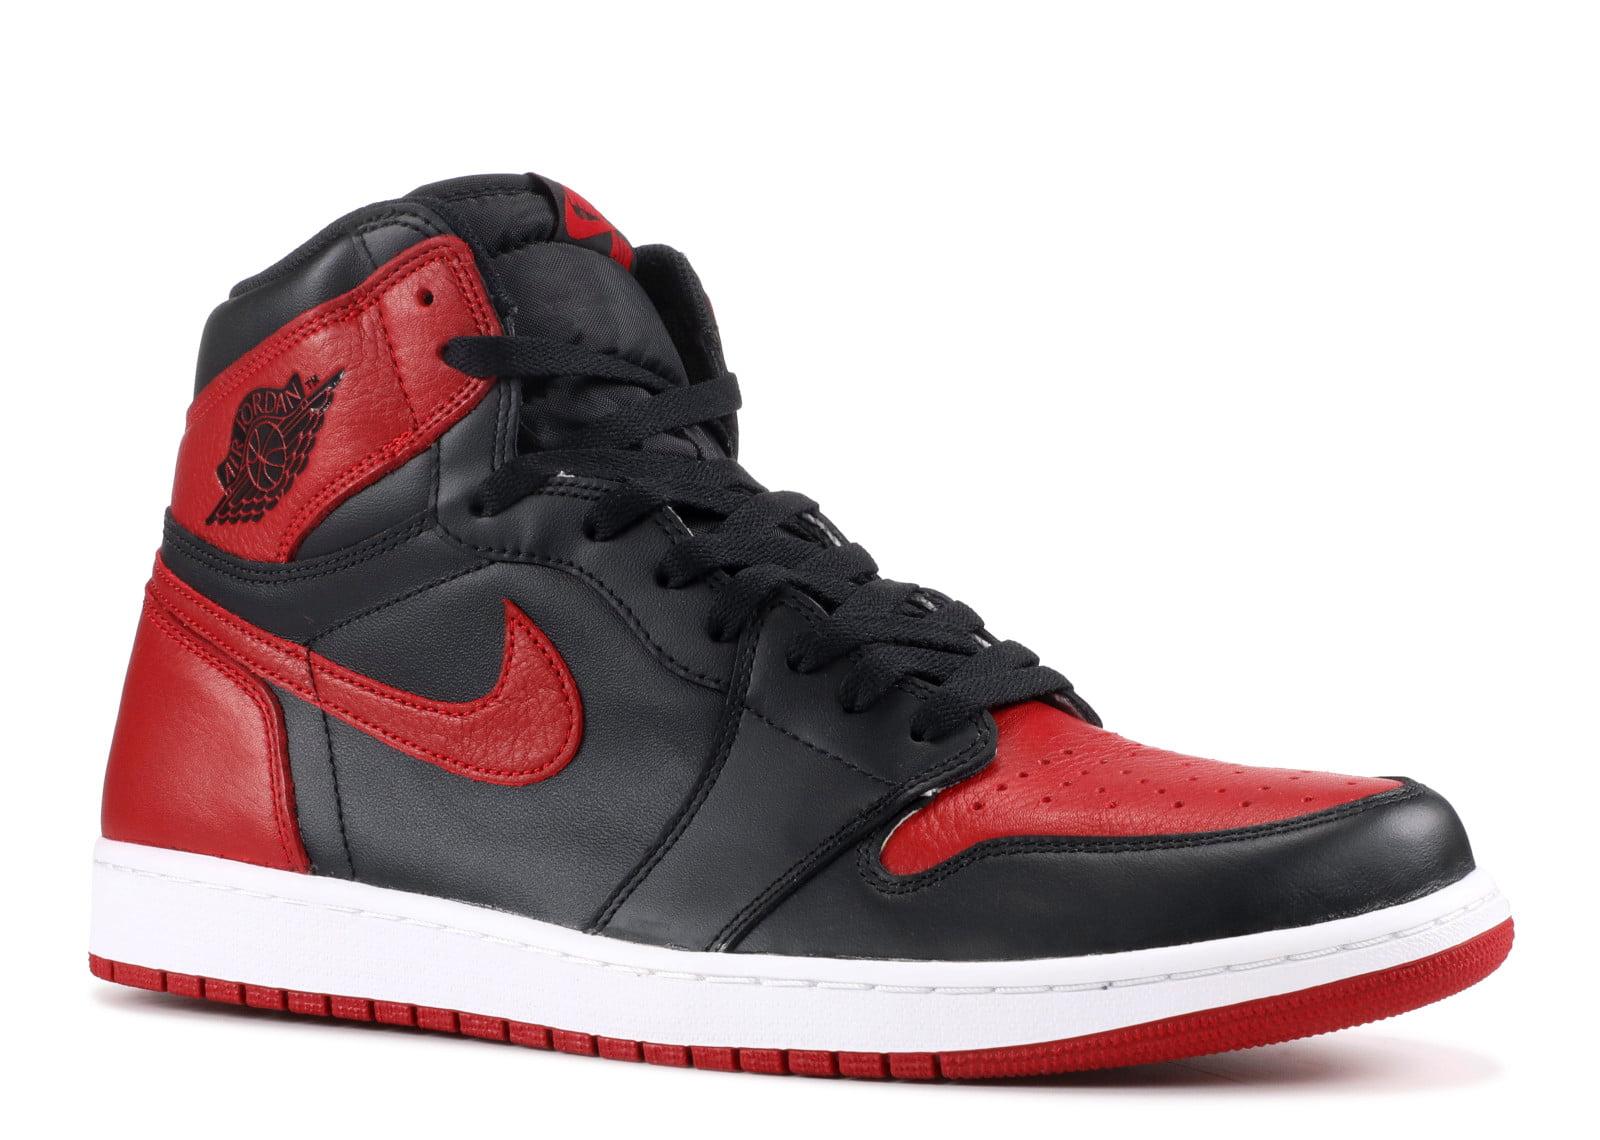 purchase cheap 2b851 6839d Air Jordan - Men - Air Jordan 1 Retro High Og Bred - 555088-001 ...